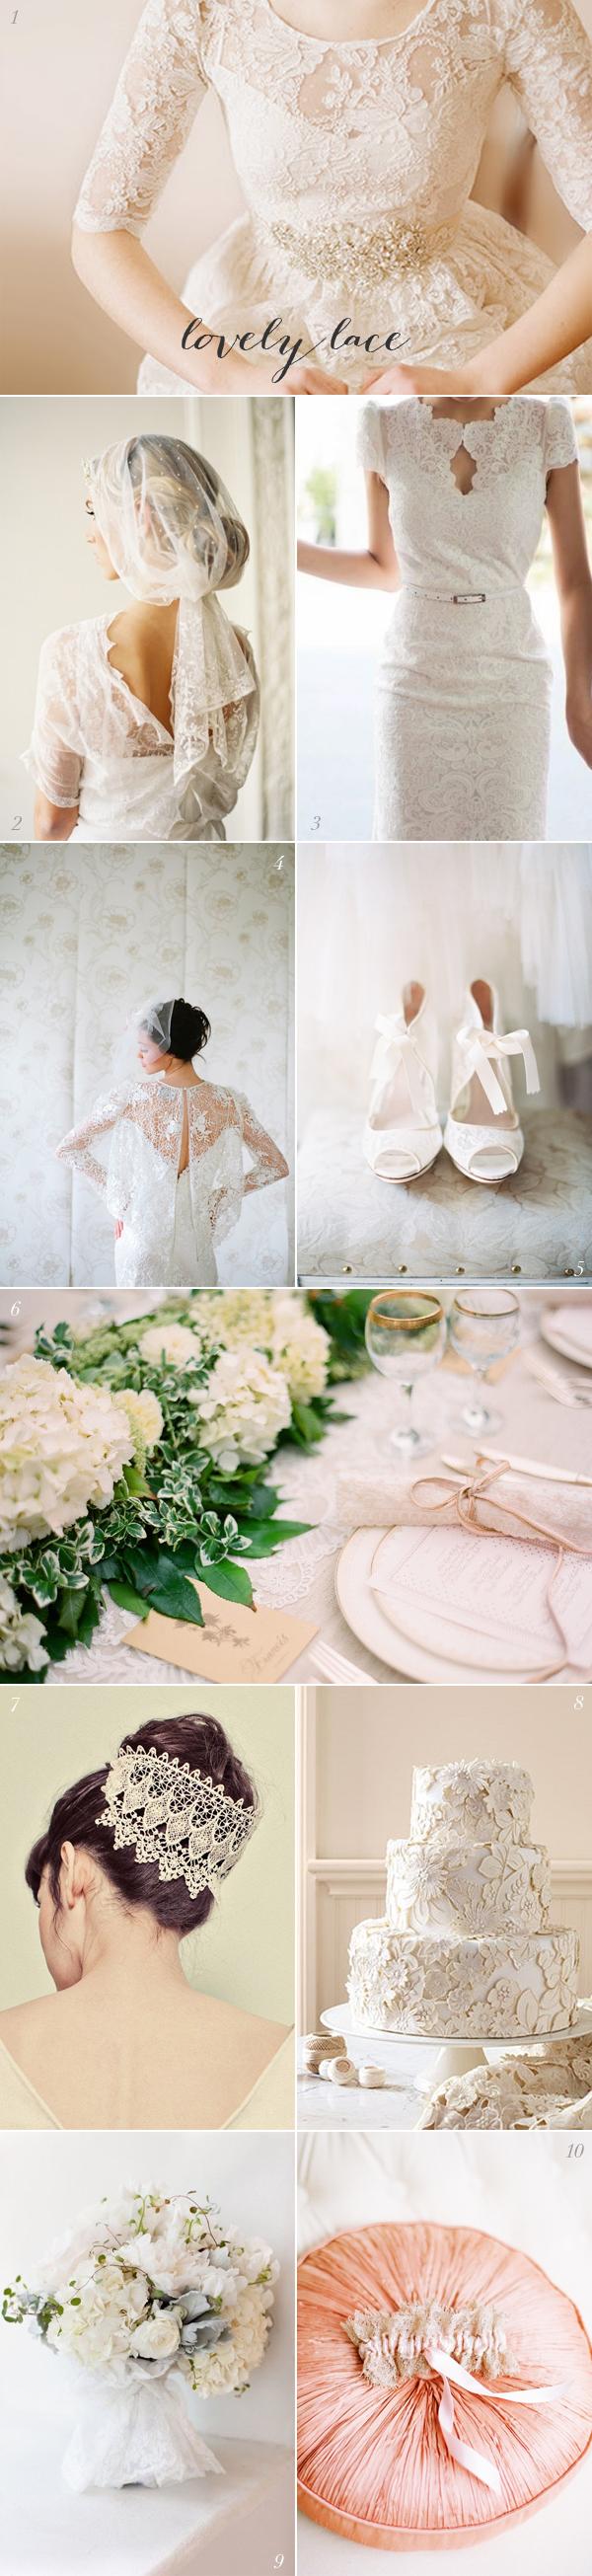 Lace Wedding Inspiration